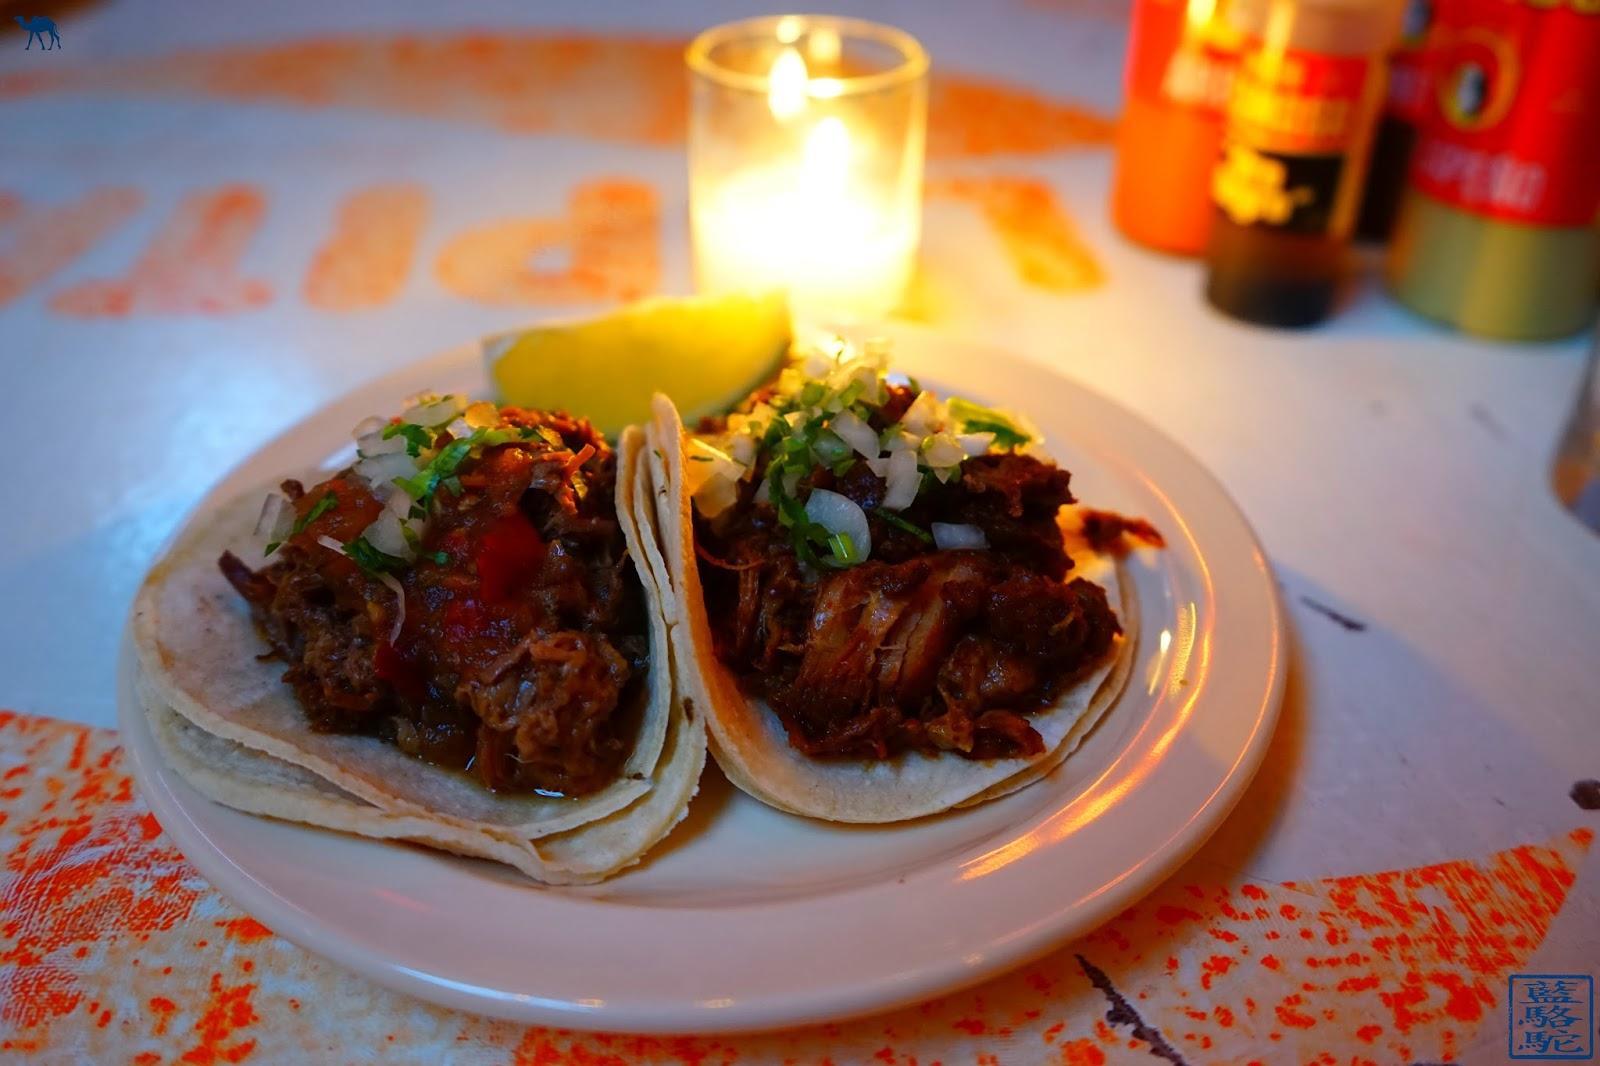 Le Chameau Bleu - Tacombi - Barbacoa Tacos New York USA